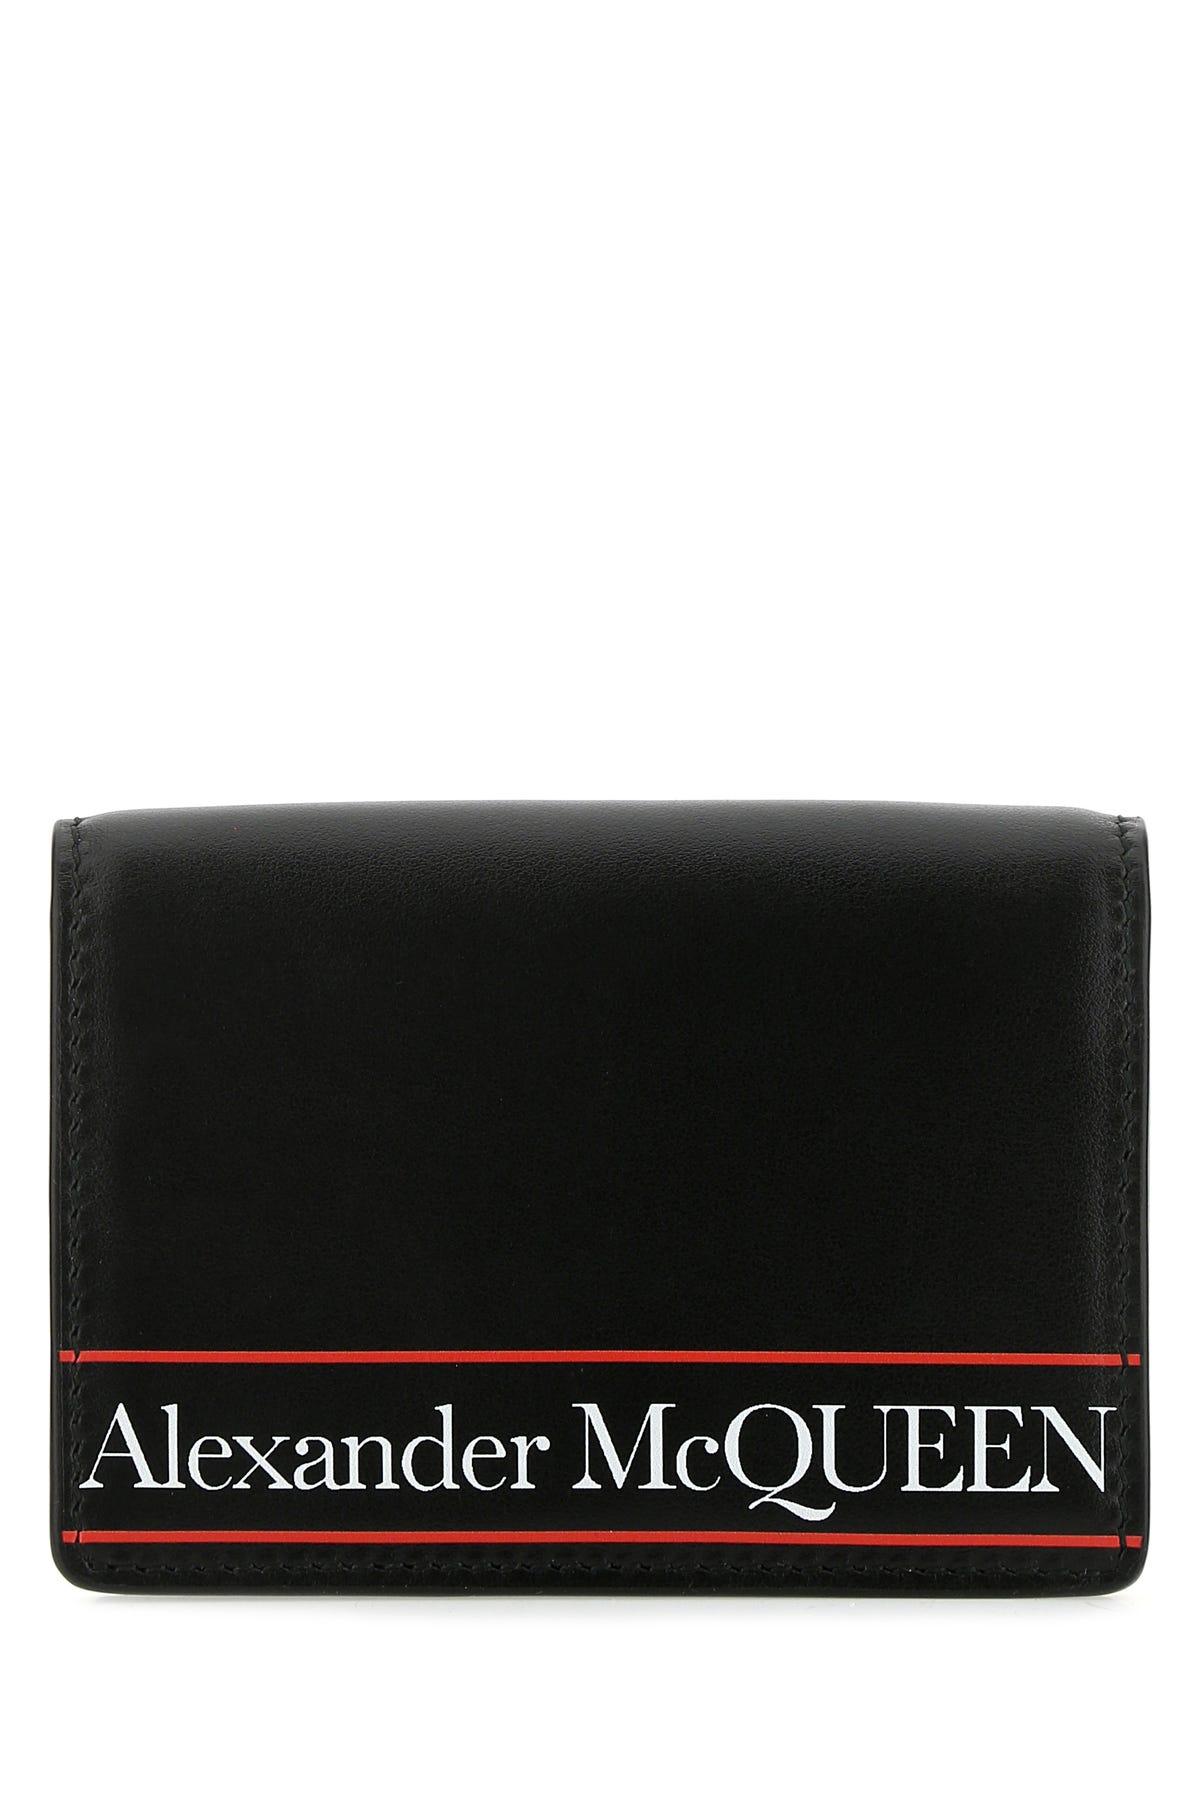 Alexander Mcqueen Porta Tessere-tu In Black